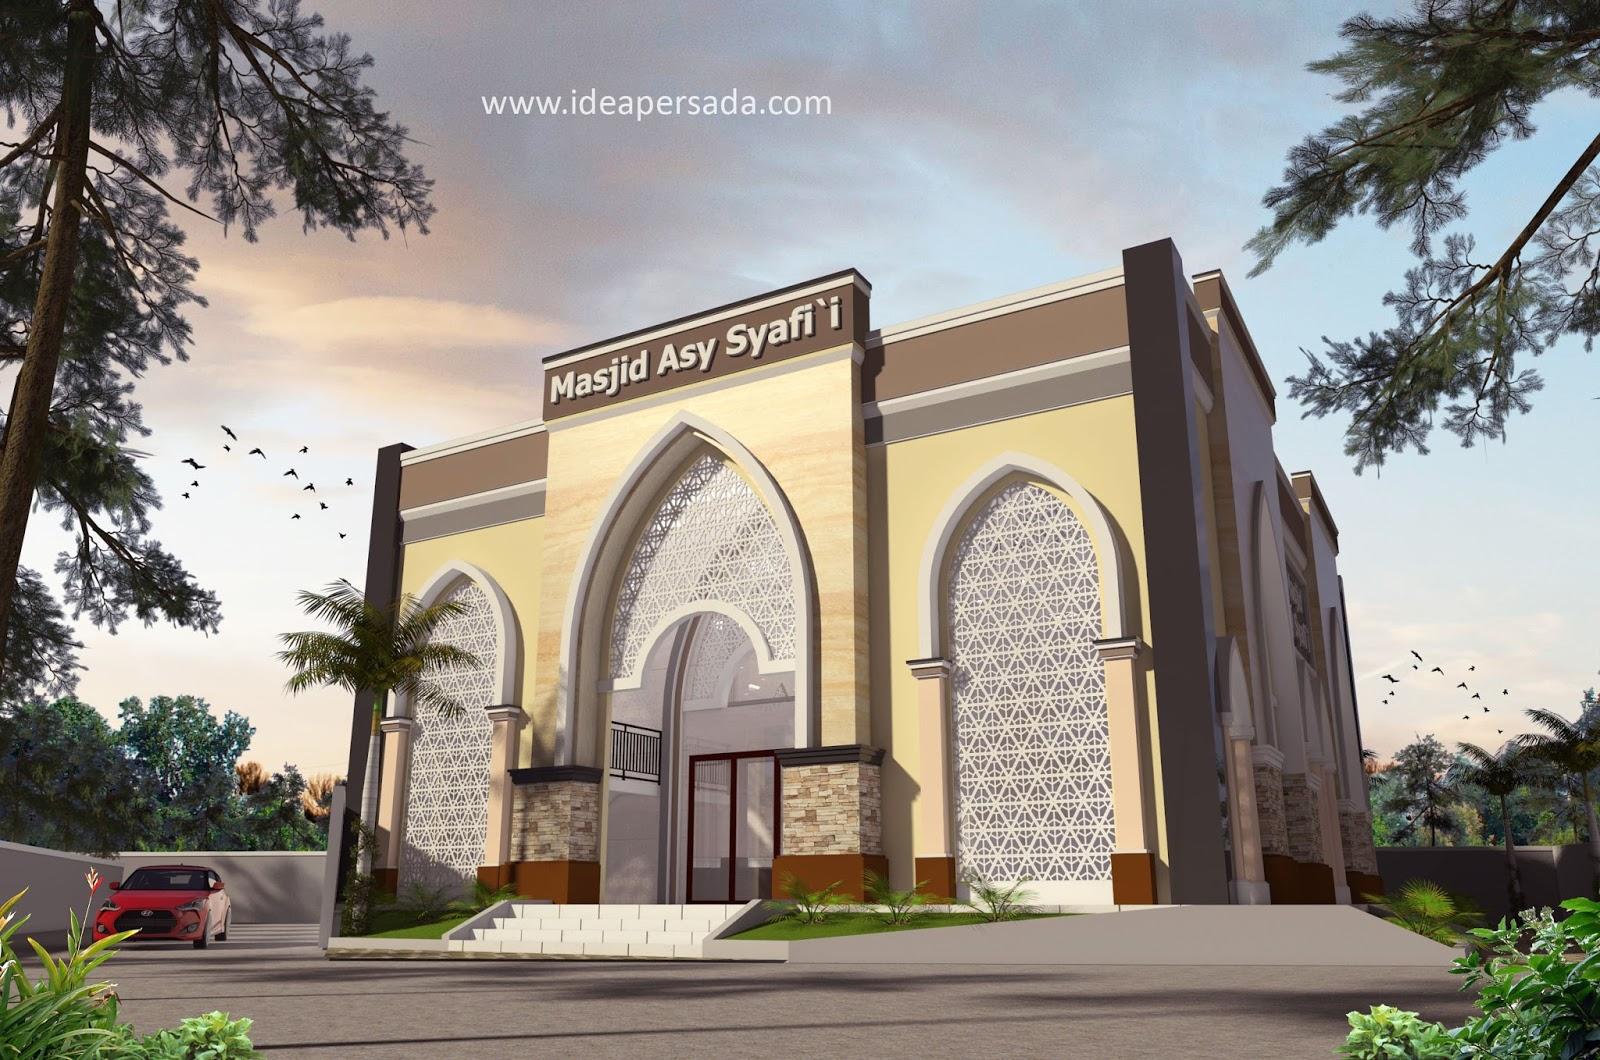 Idea Persada Arsitektur Desain Desain Masjid Asy Syafi I Riau